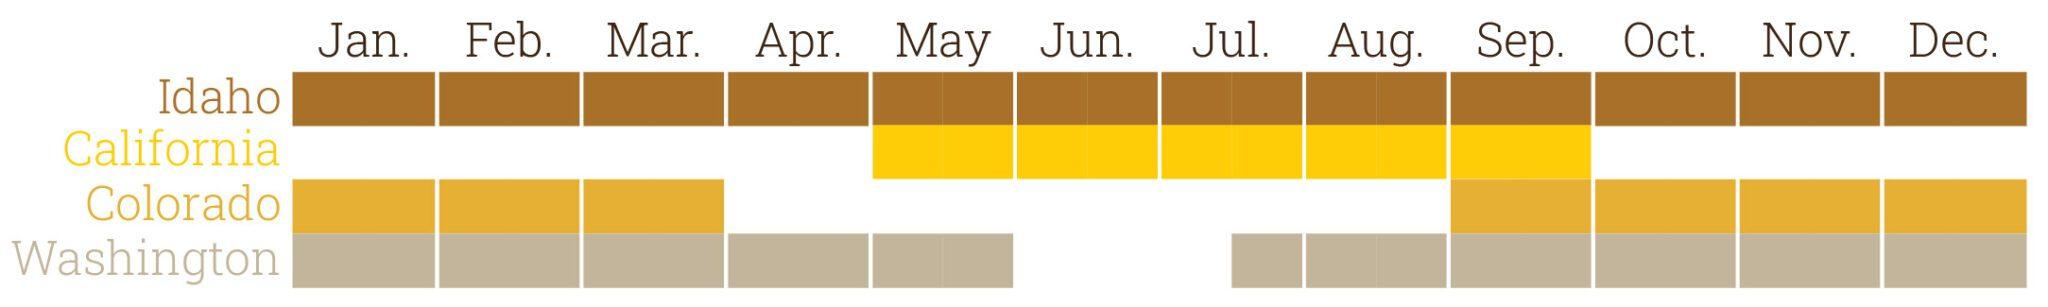 yellow potato availability chart